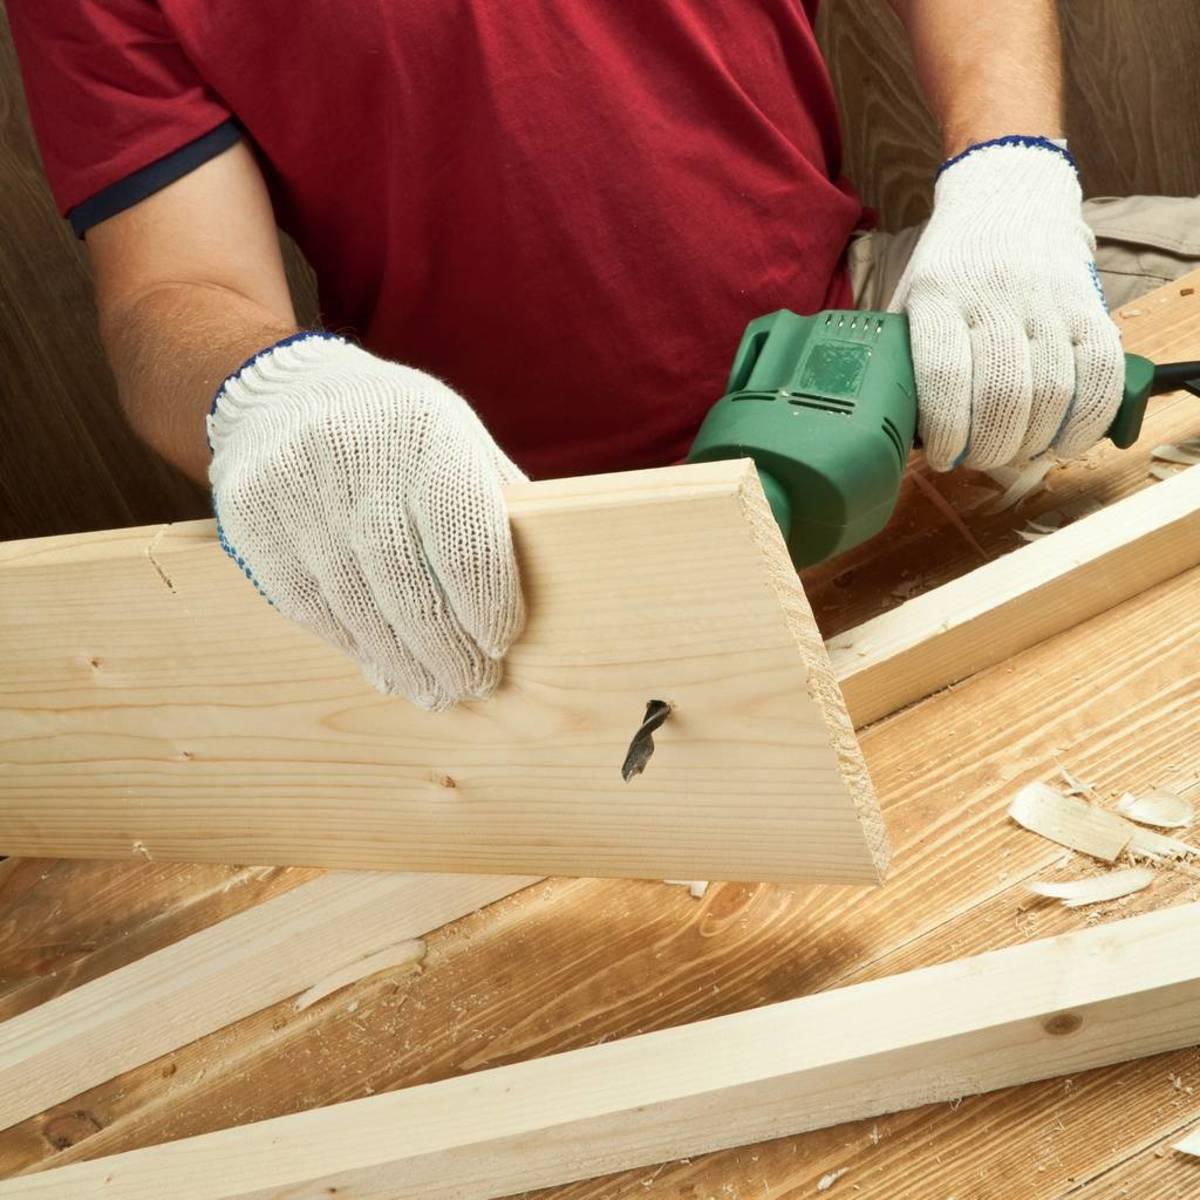 50-handyman-business-names